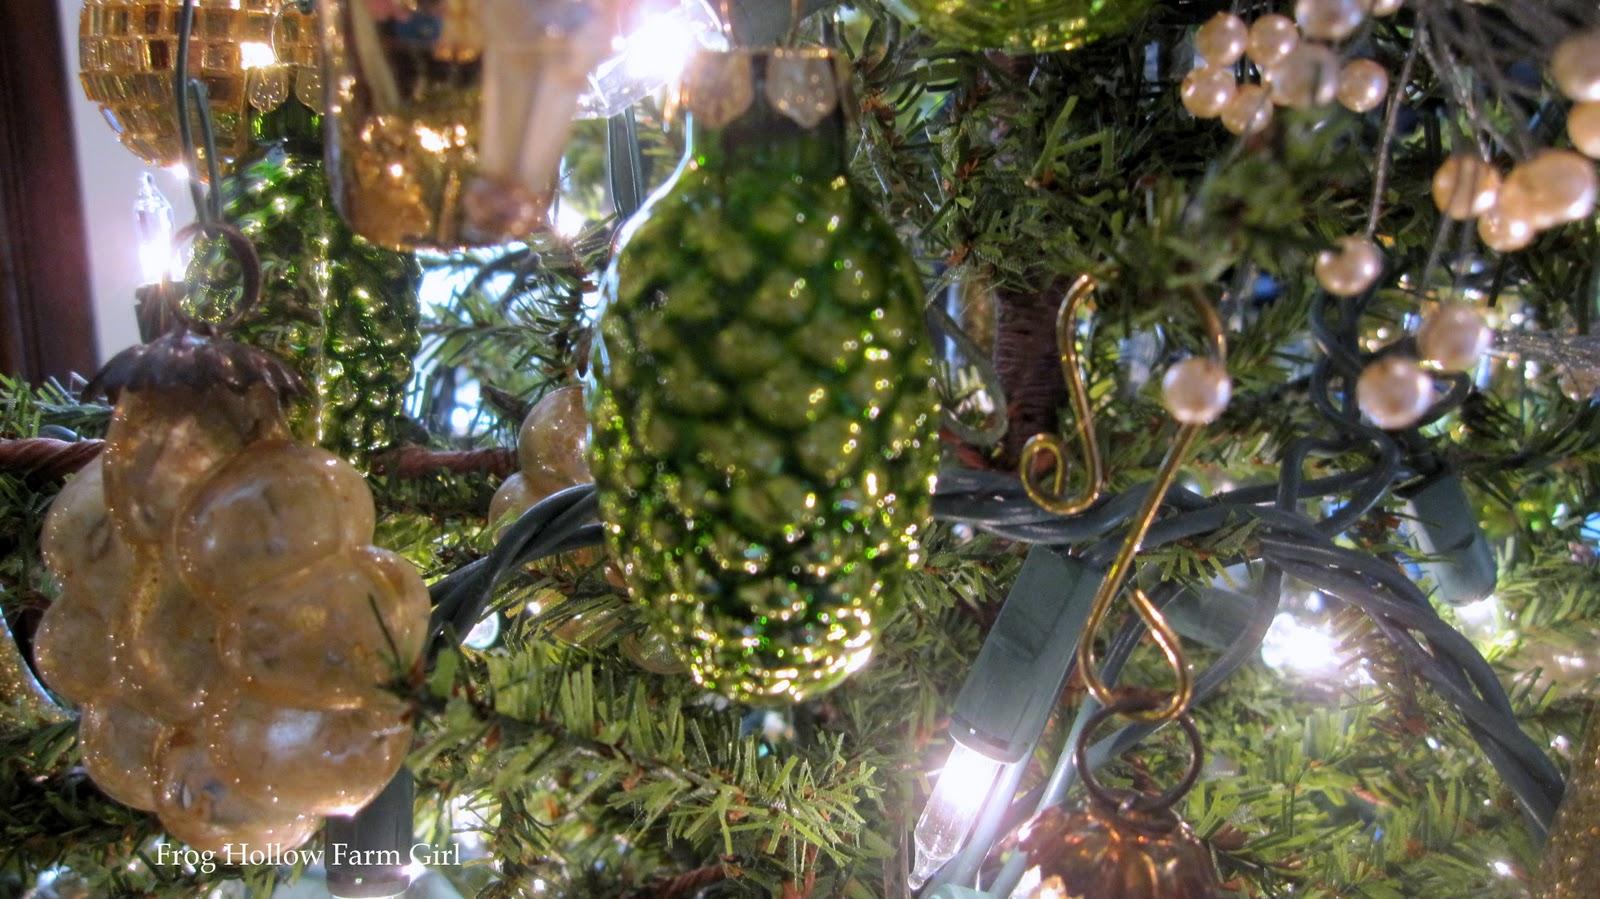 Frog Hollow Farm Girl: My Irish Christmas Tree At Frog